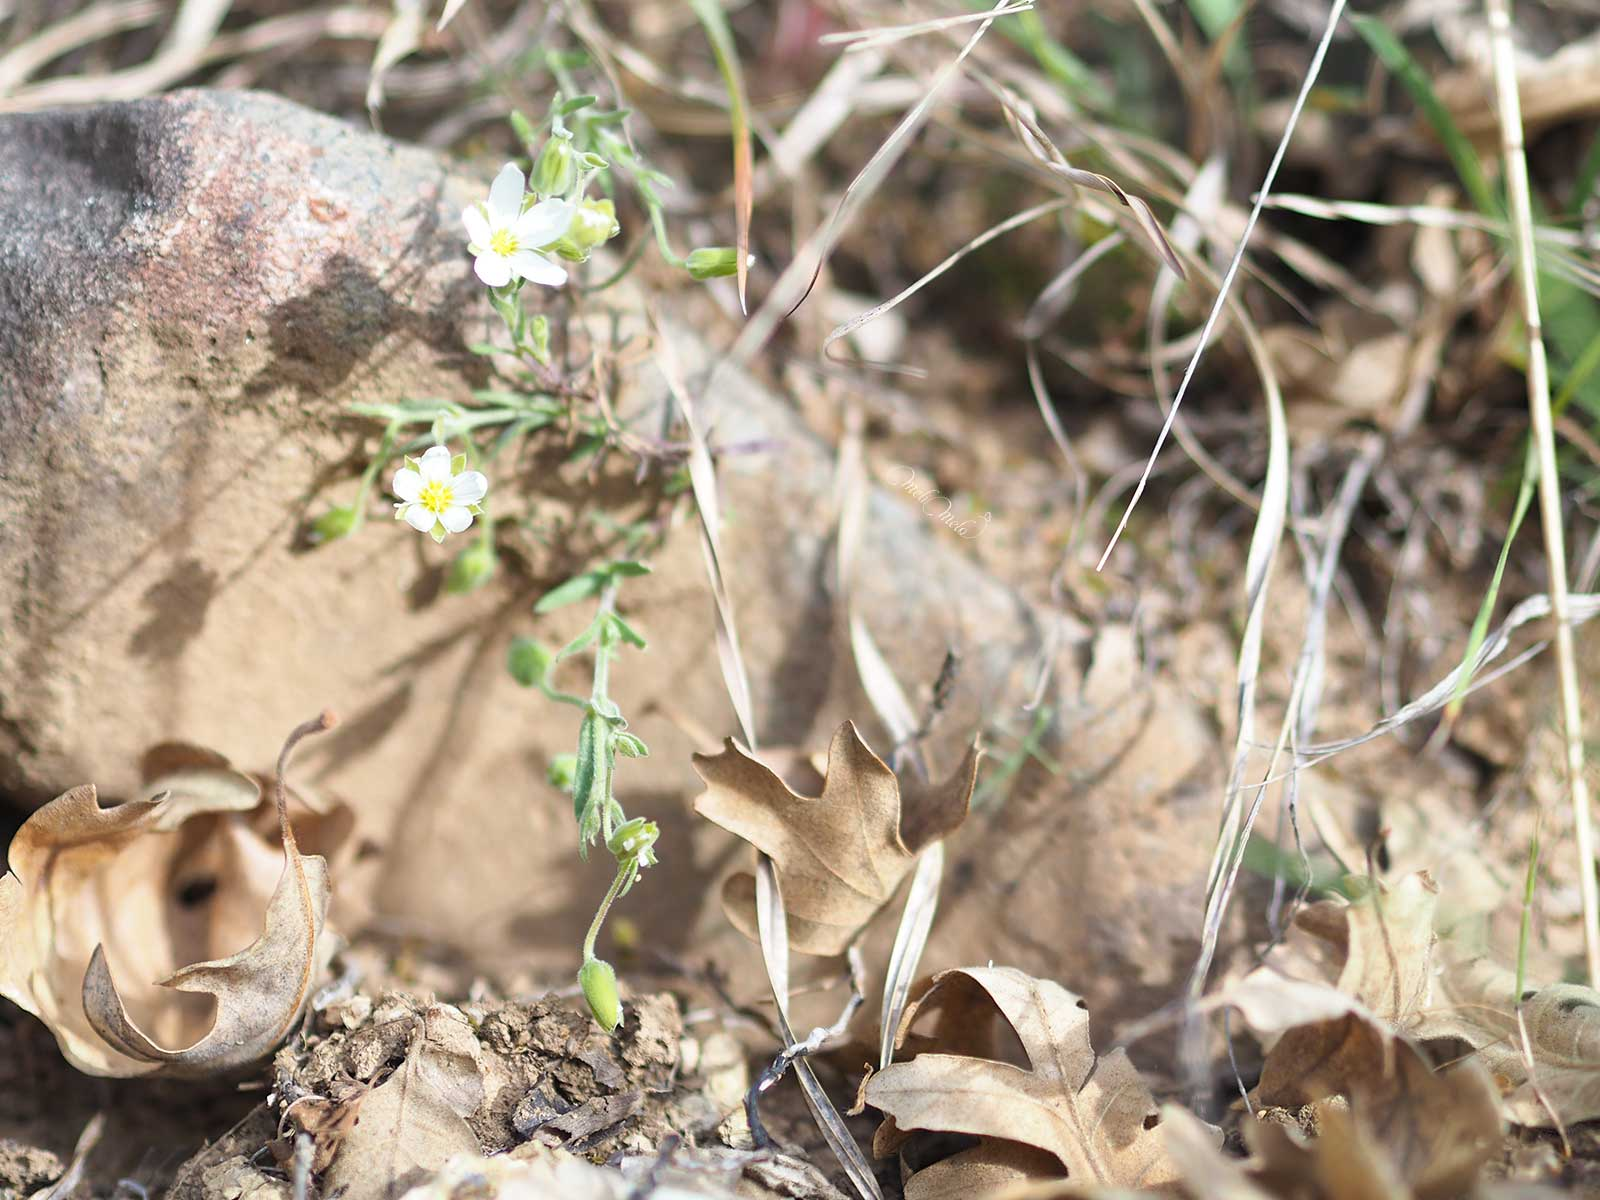 feuilles-fleurs-fin-ete-sanabria-zamora-laboutiquedemelimelo